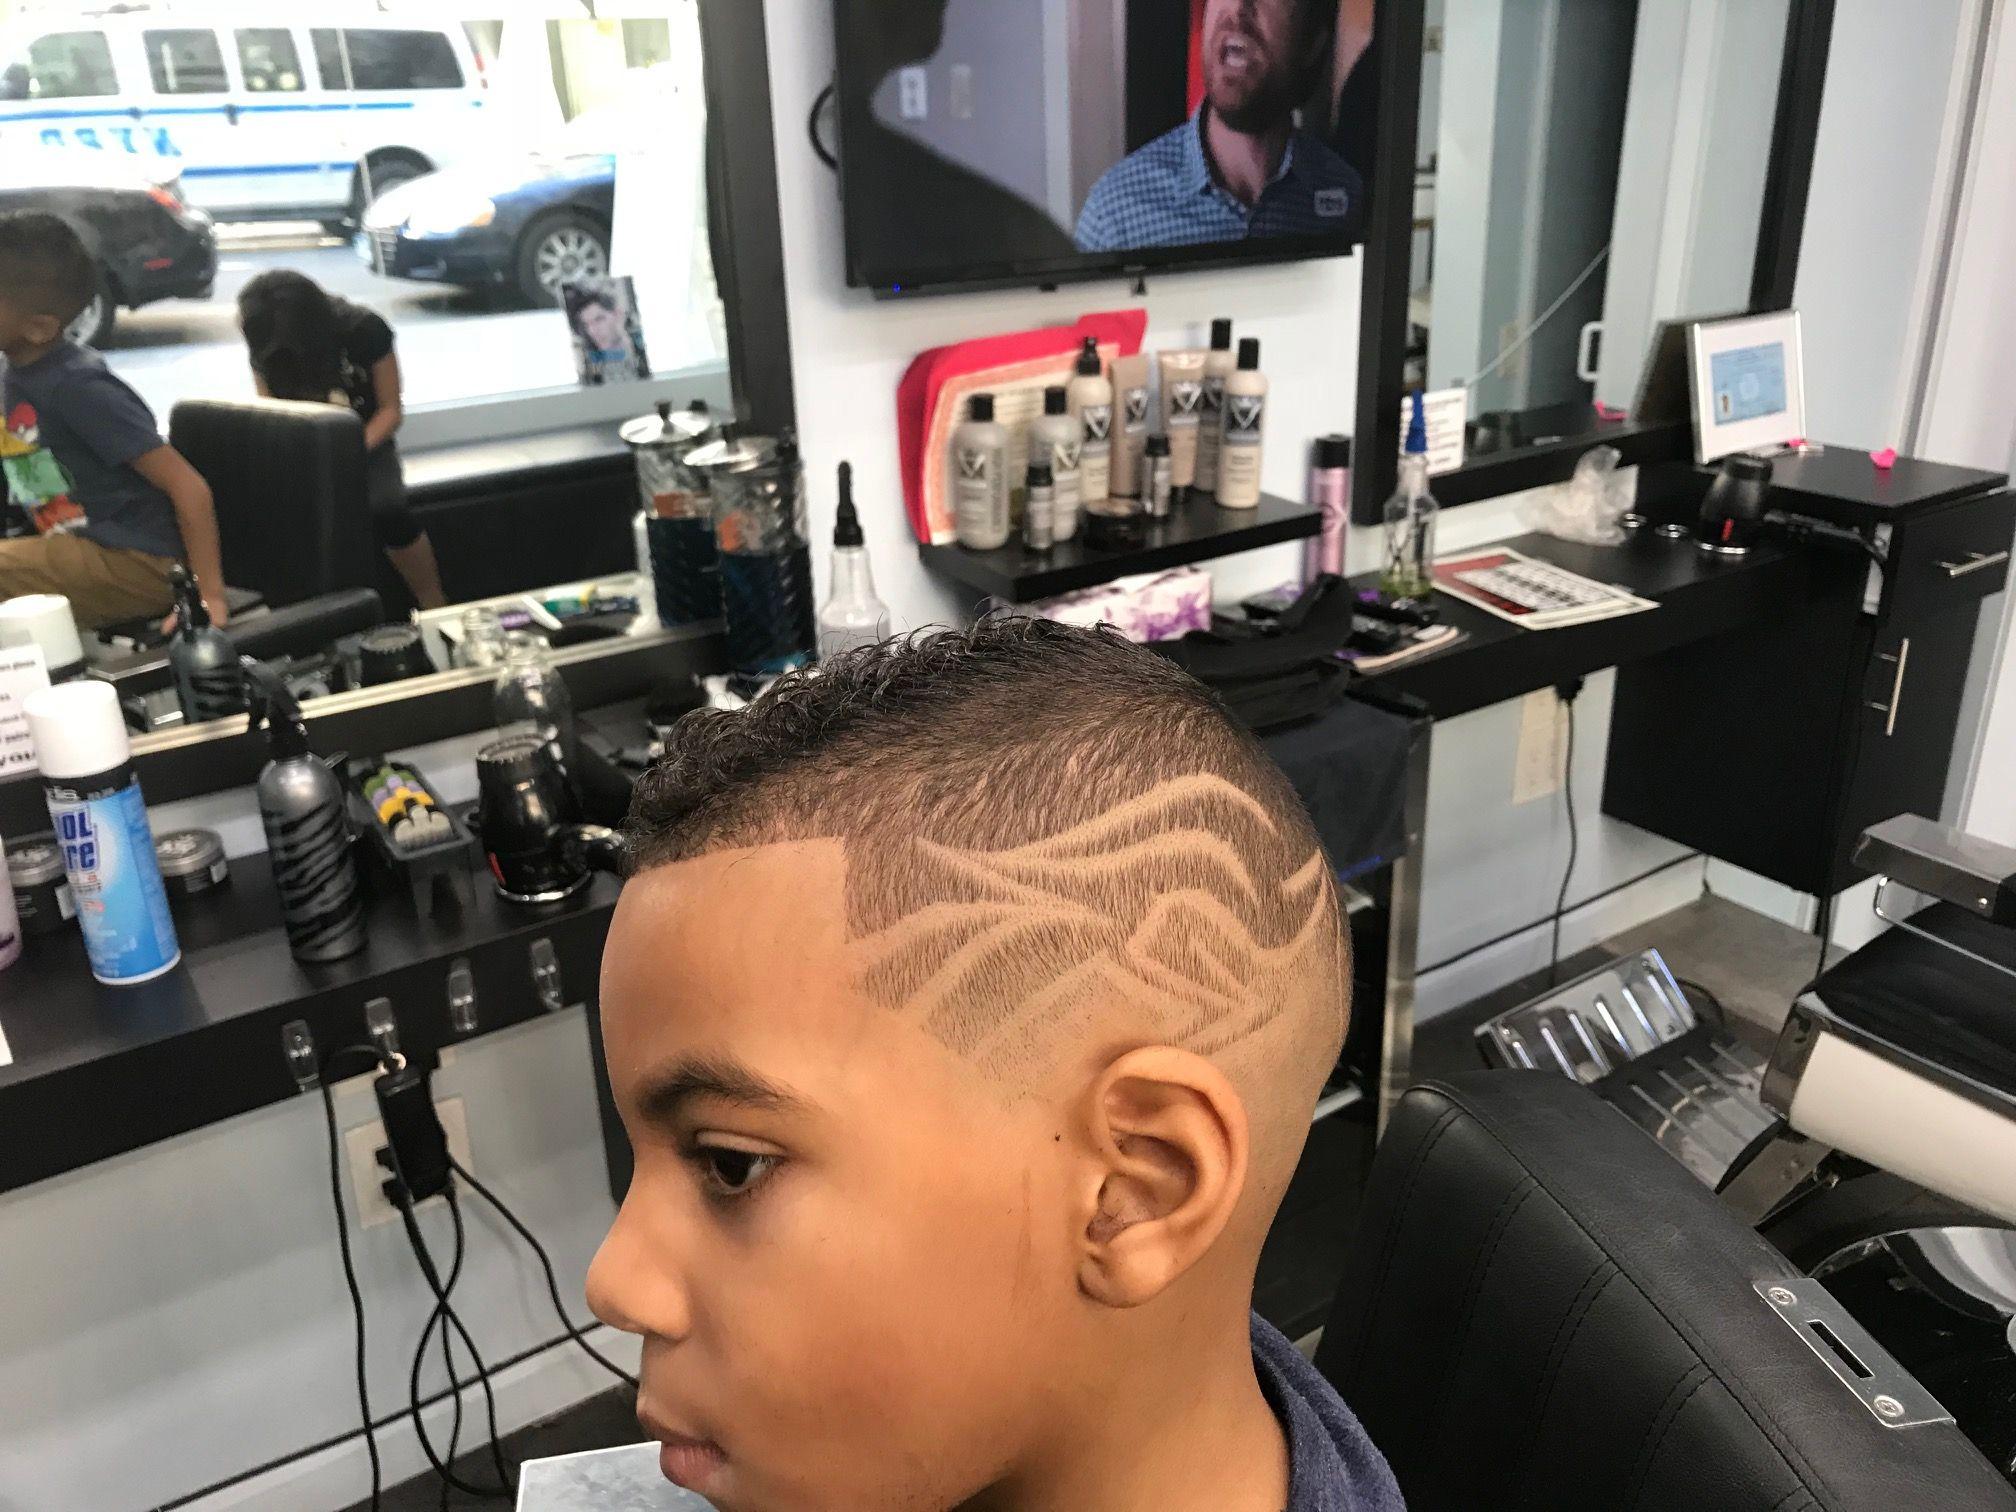 Black Hair Salon Nyc Midtown All The Best Hair Salon In 2018